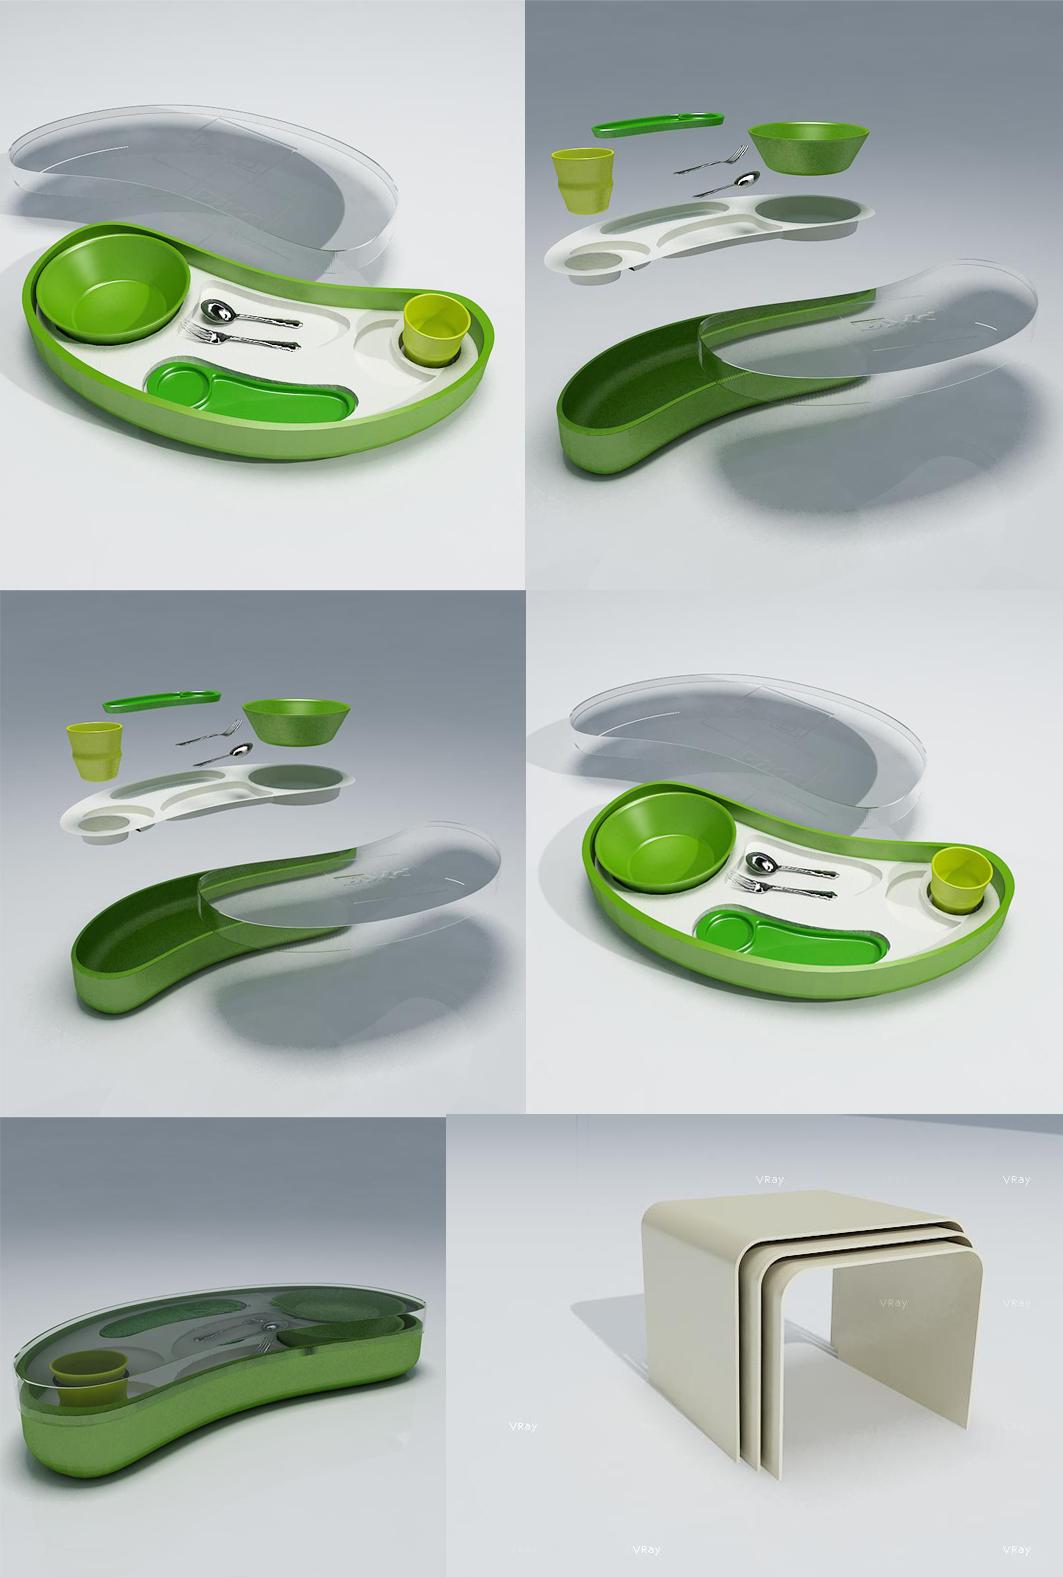 набор посуды для РЖД